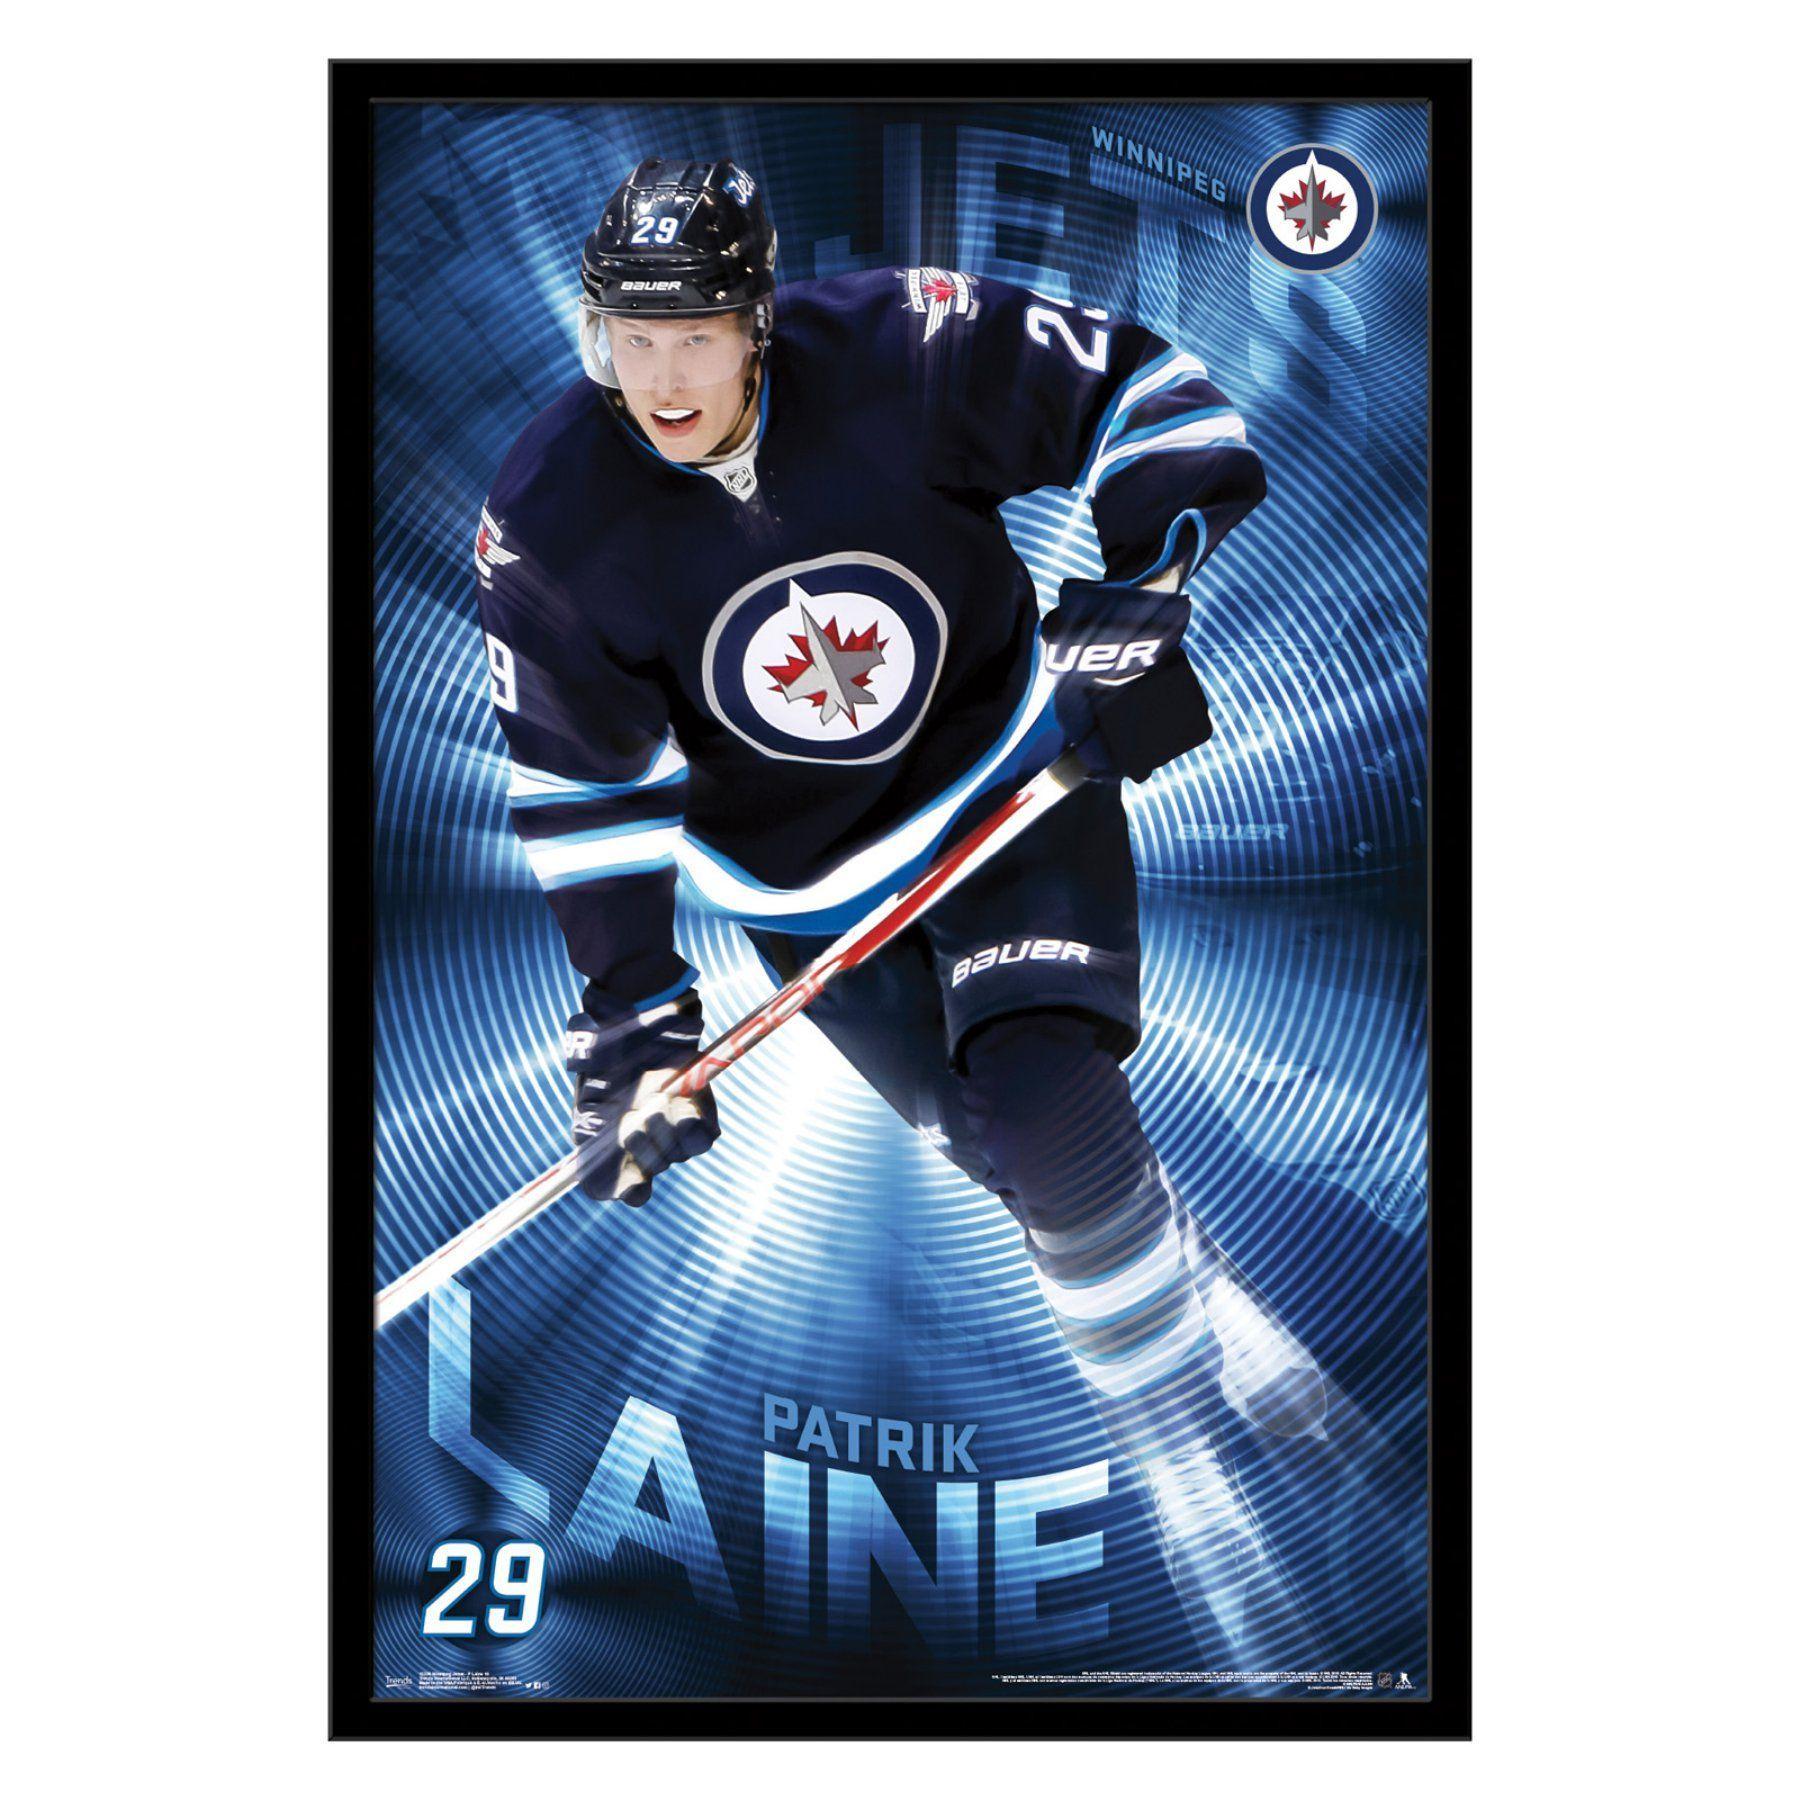 Trends International Winnipeg Jets   Patrick Laine Wall Poster 1800x1800